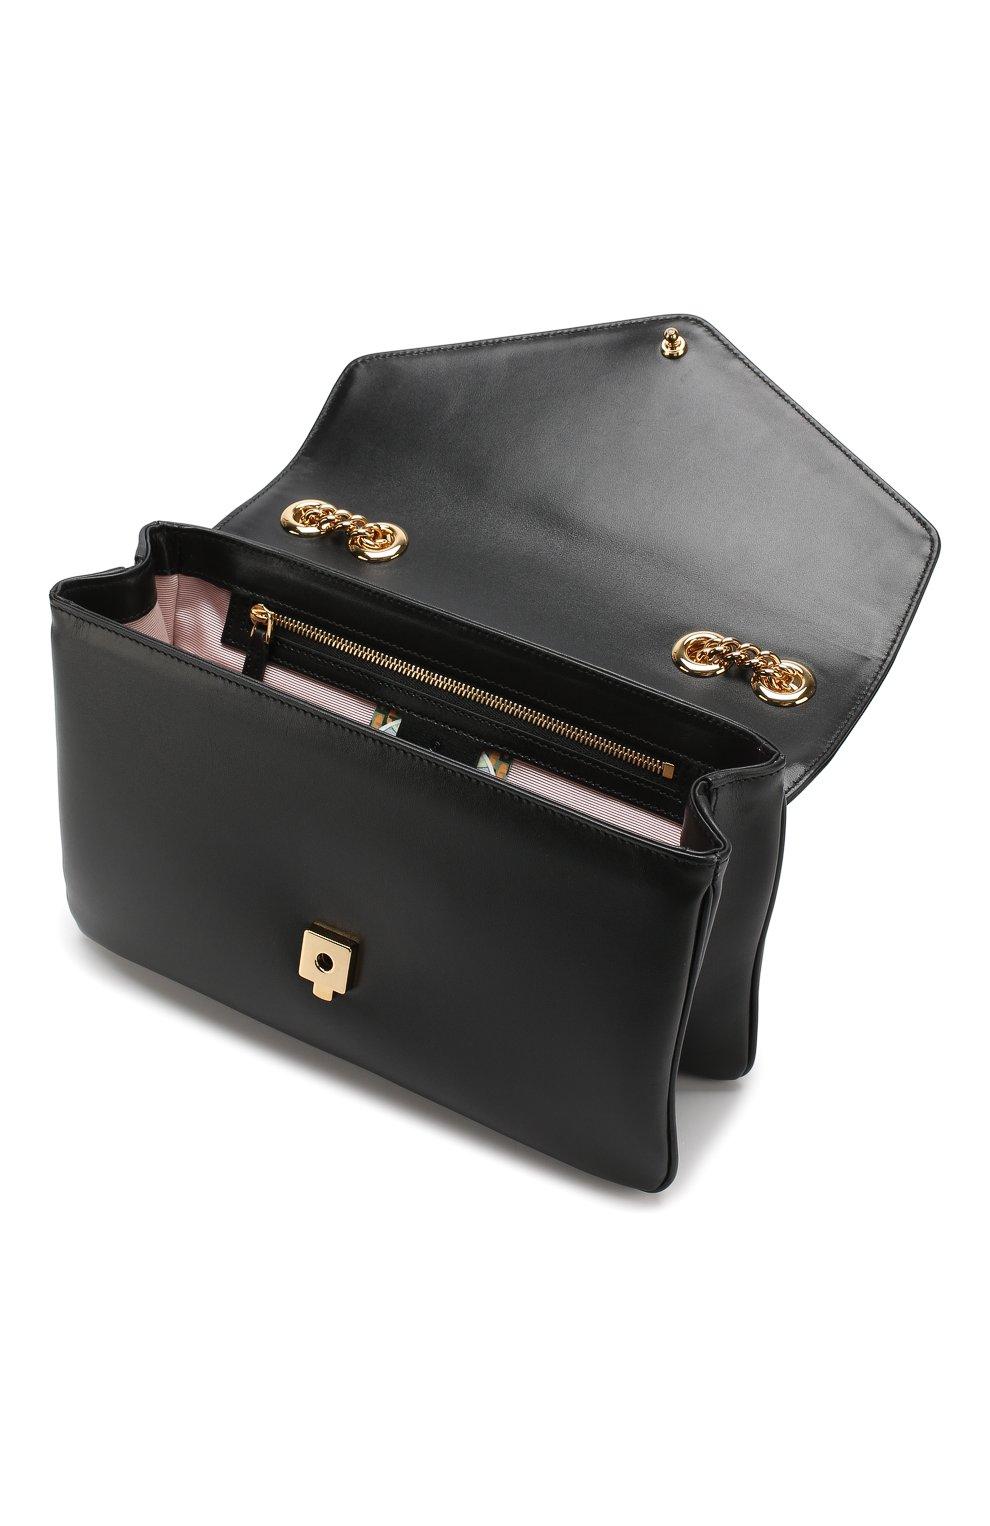 14a853dbd3aa Сумки Gucci по цене от 56 000 руб. купить в интернет-магазине ЦУМ